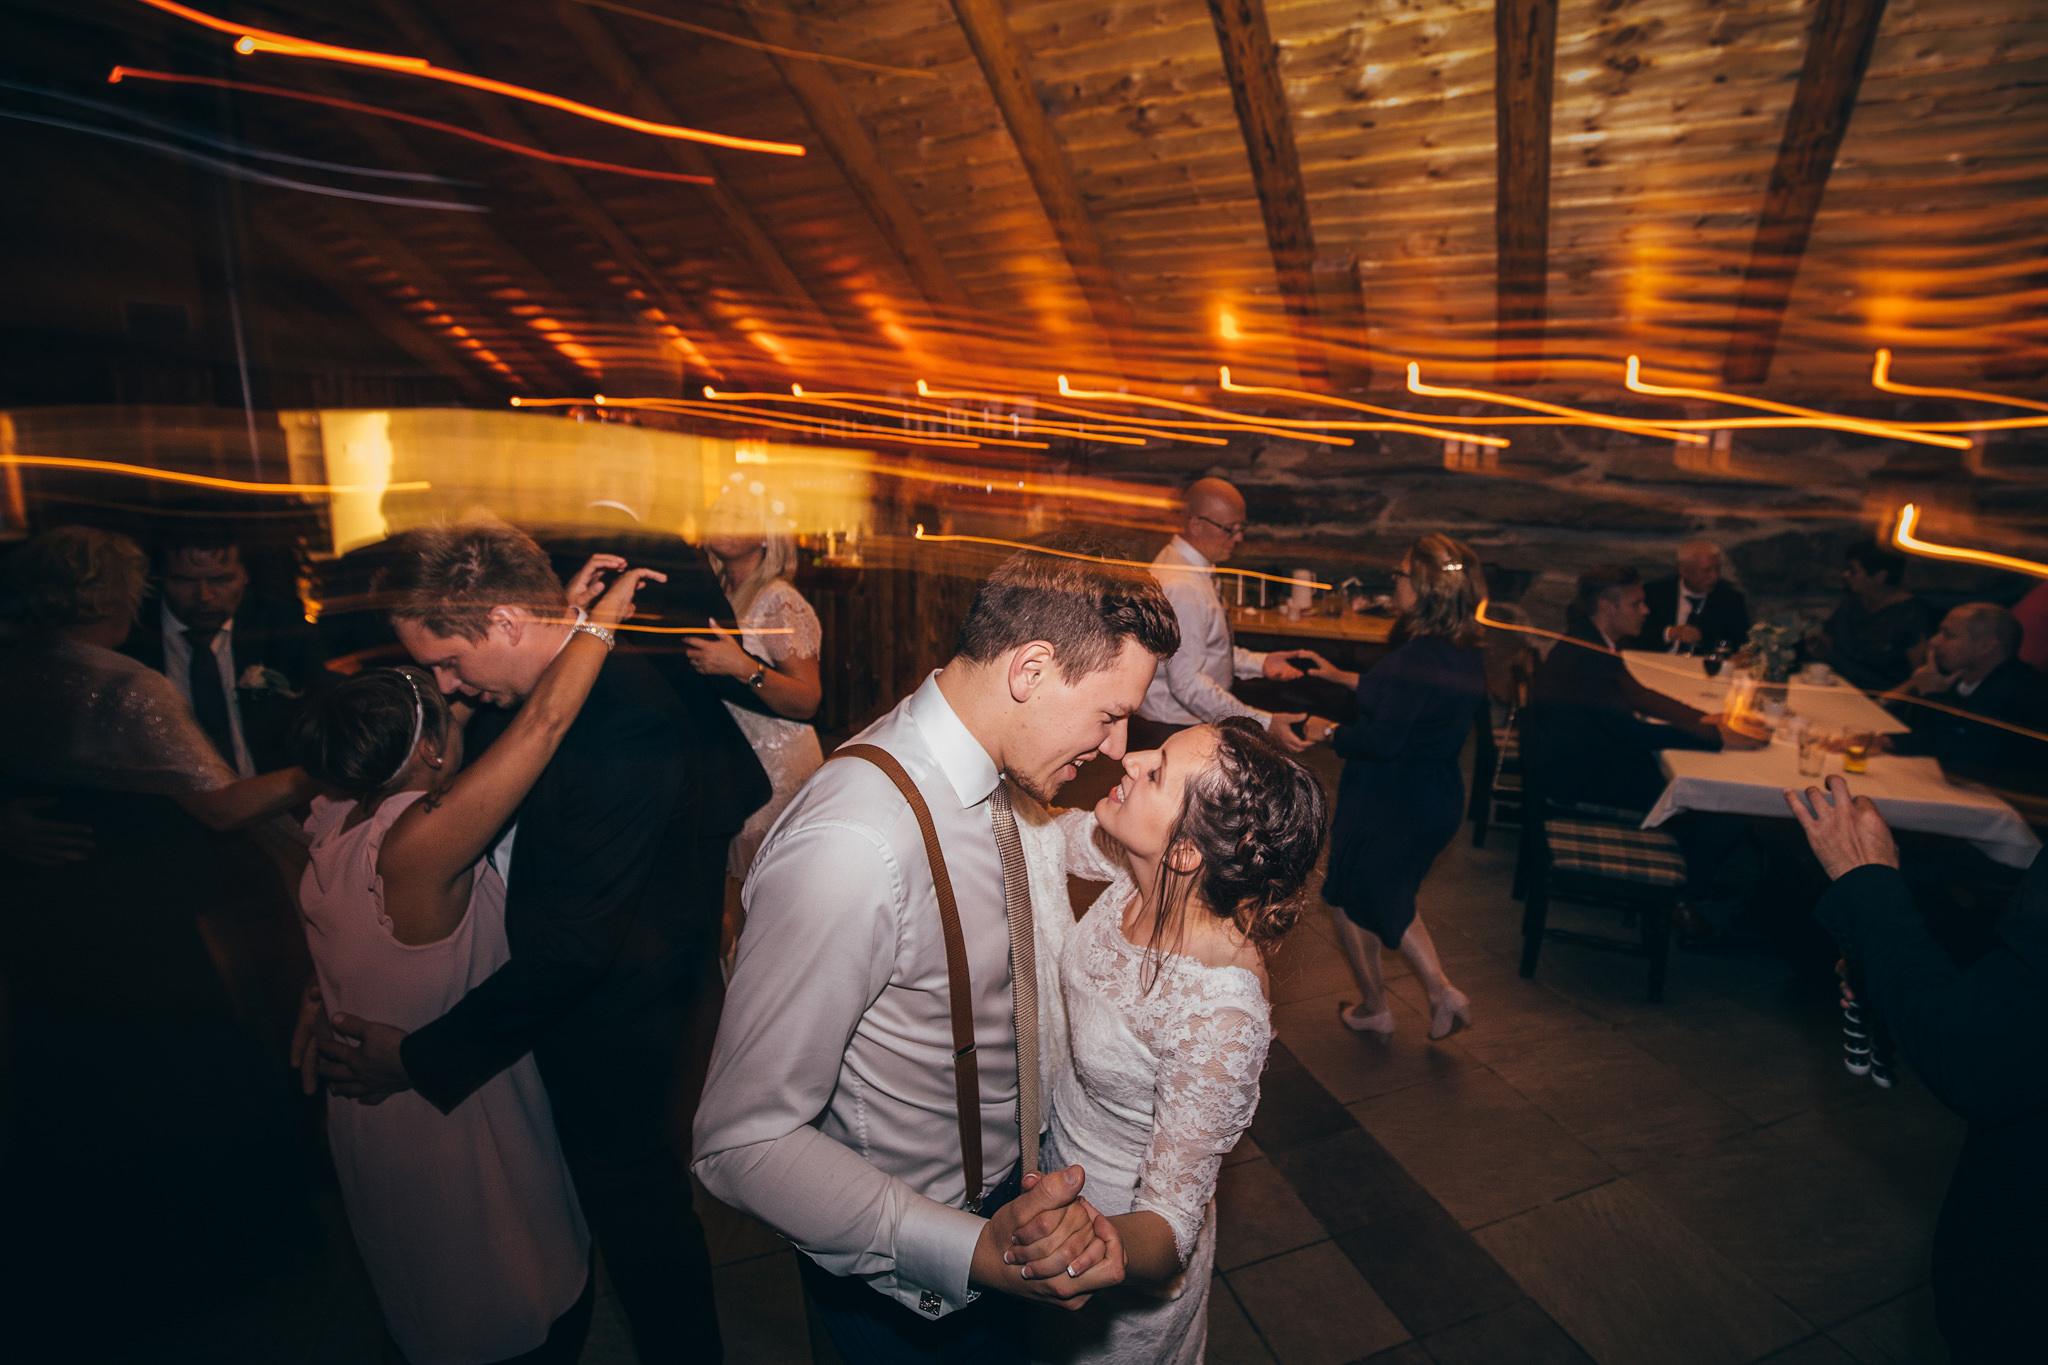 Norway+wedding+photographer+elopement+pre+wedding+Casey+Arneson-131.jpg